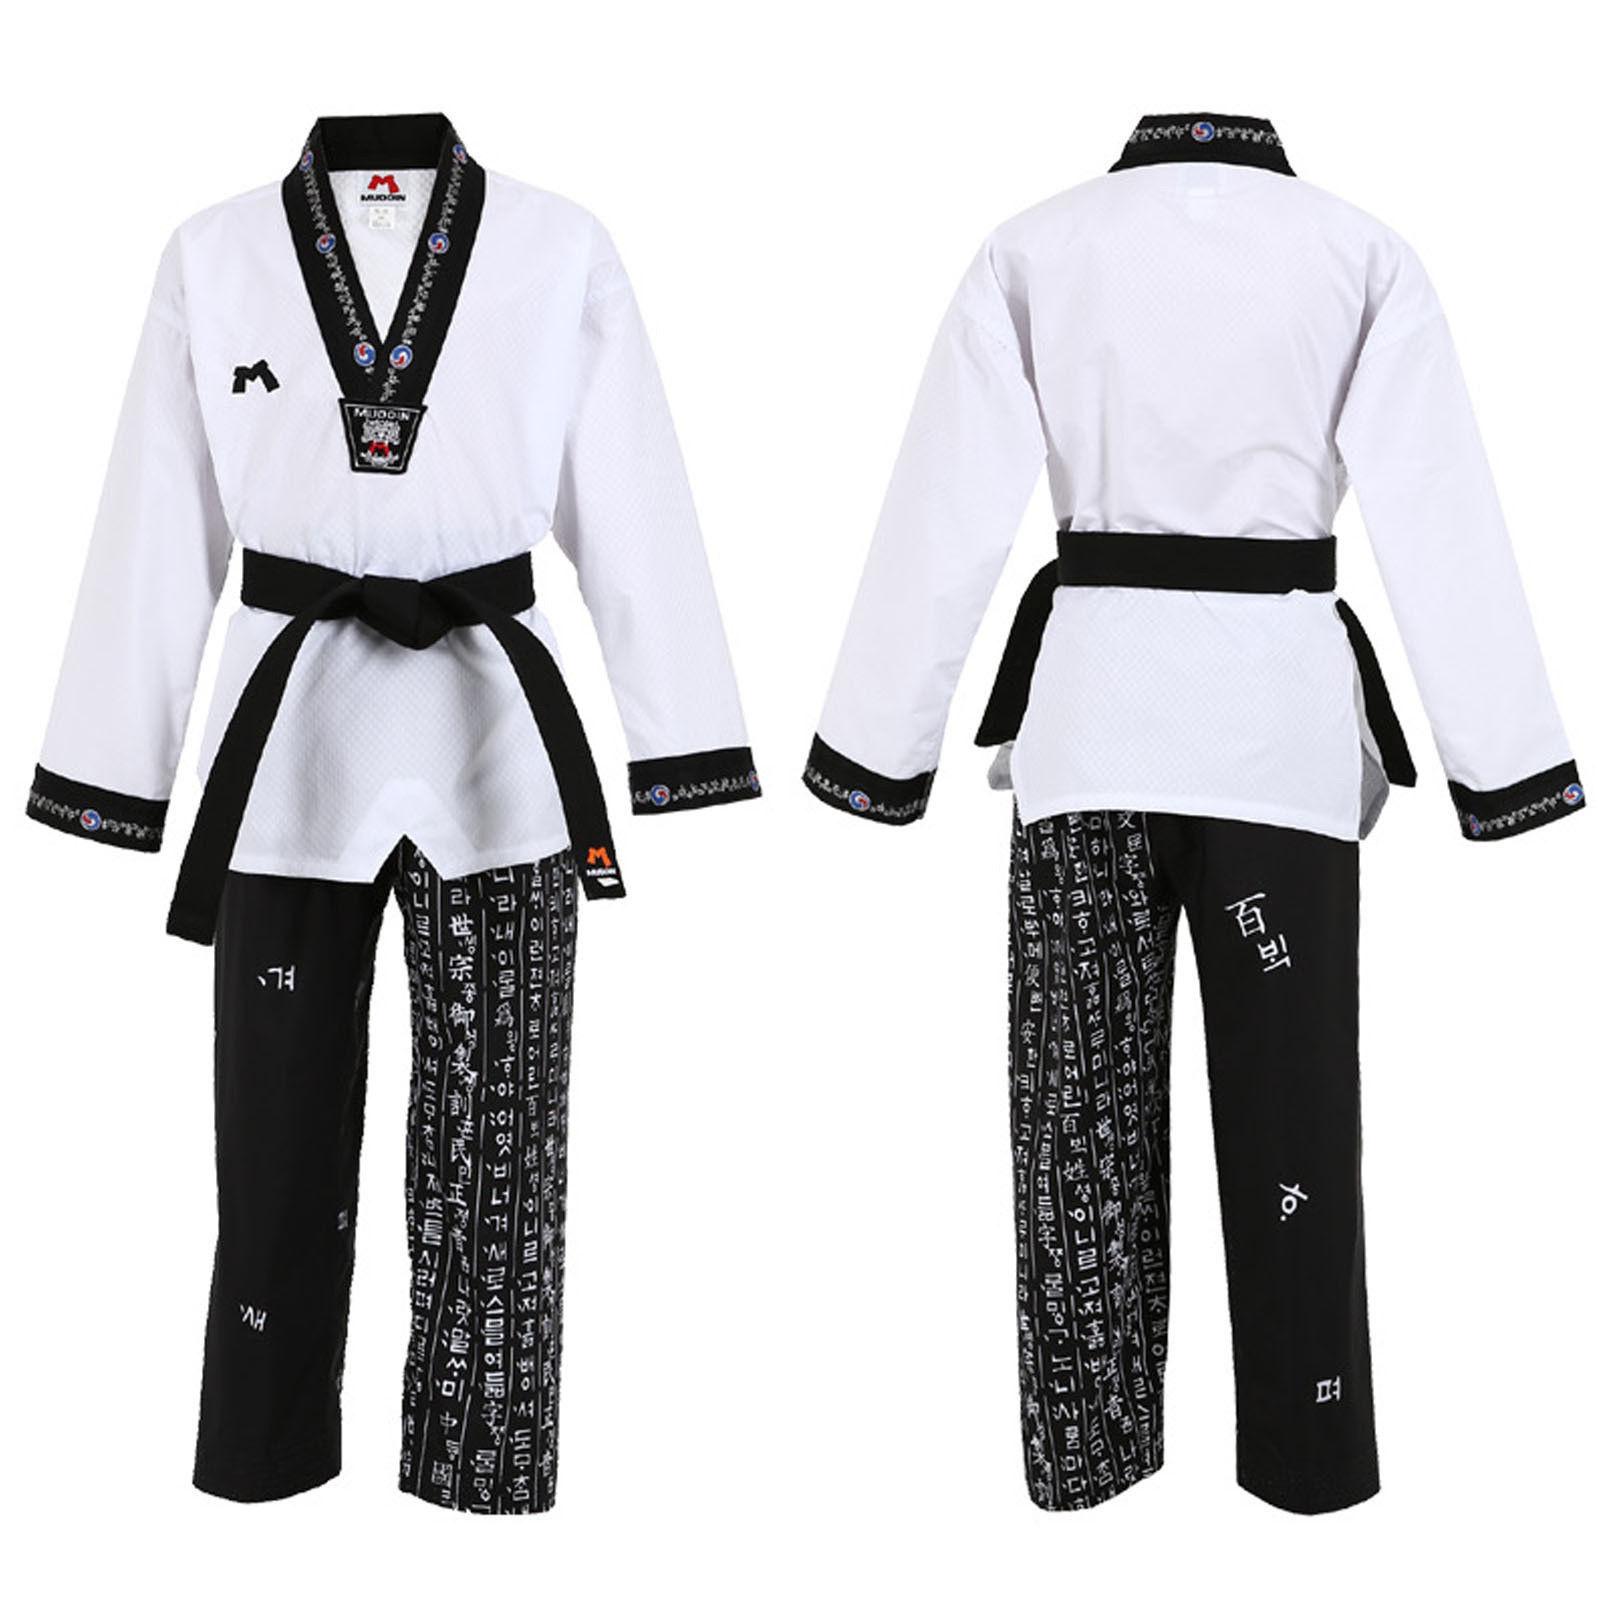 Hangul V Neck Uniforms Taekwondo Doboks And 50 Similar Items